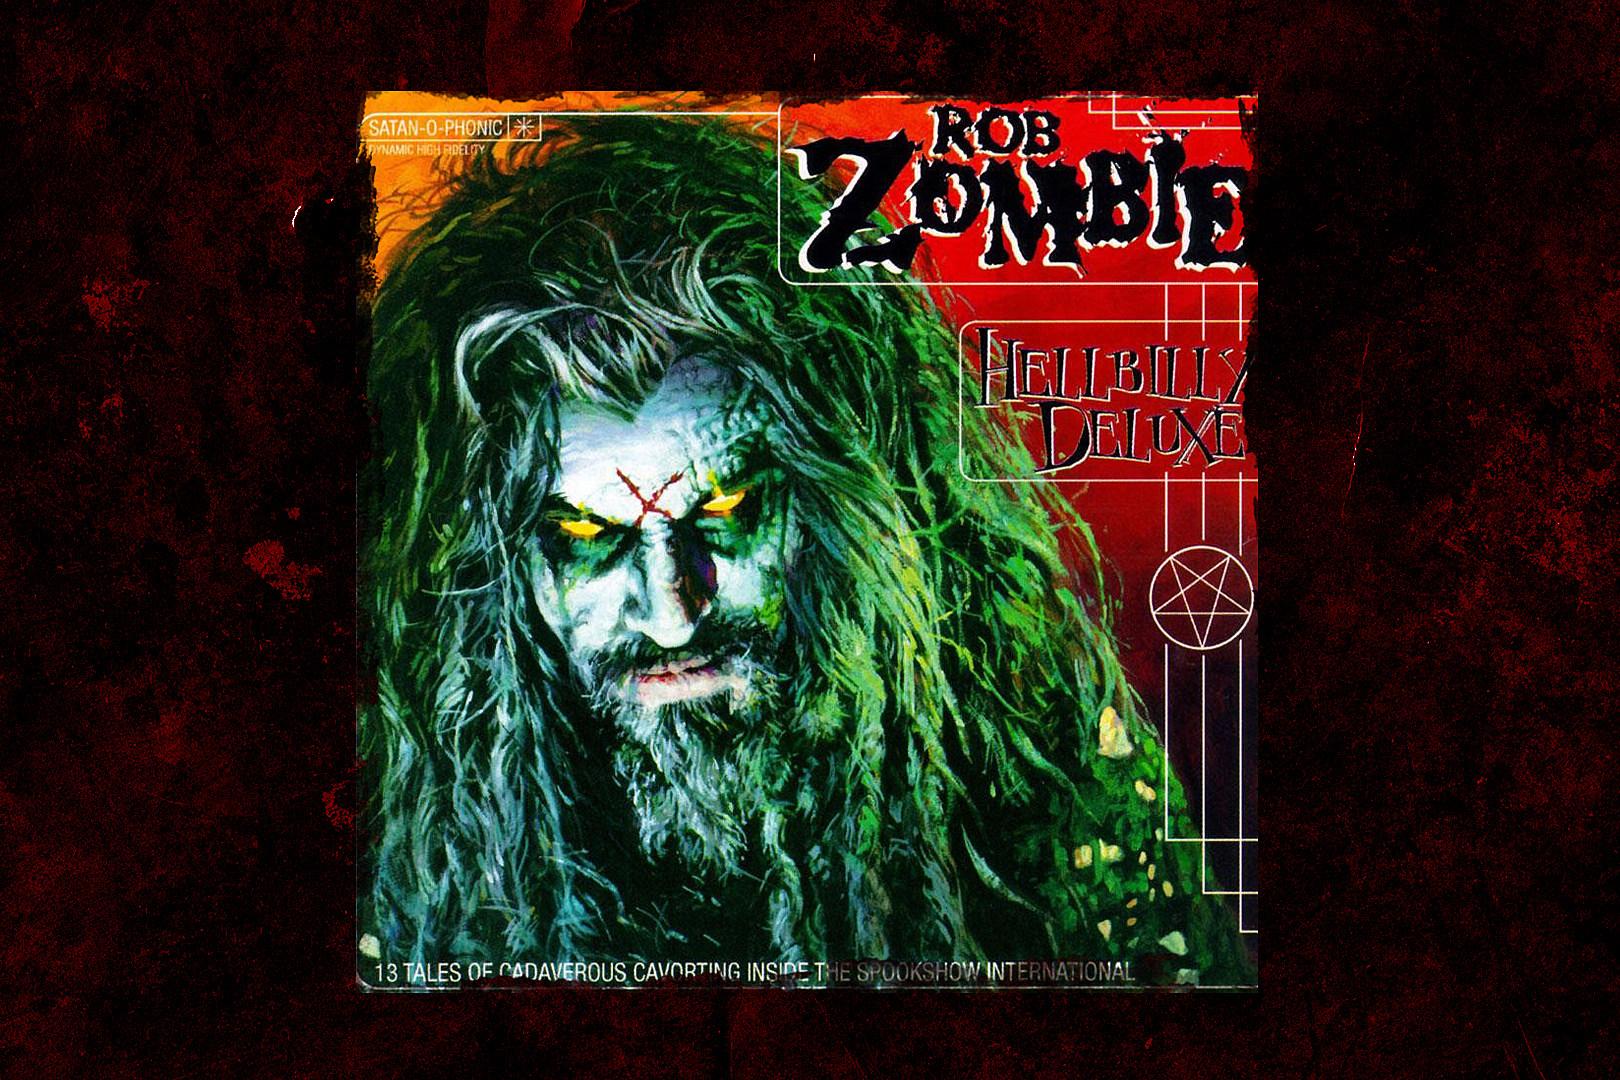 Rob Zombie Tour 2020.Rob Zombie Eyes Early 2020 Release For His Next Album